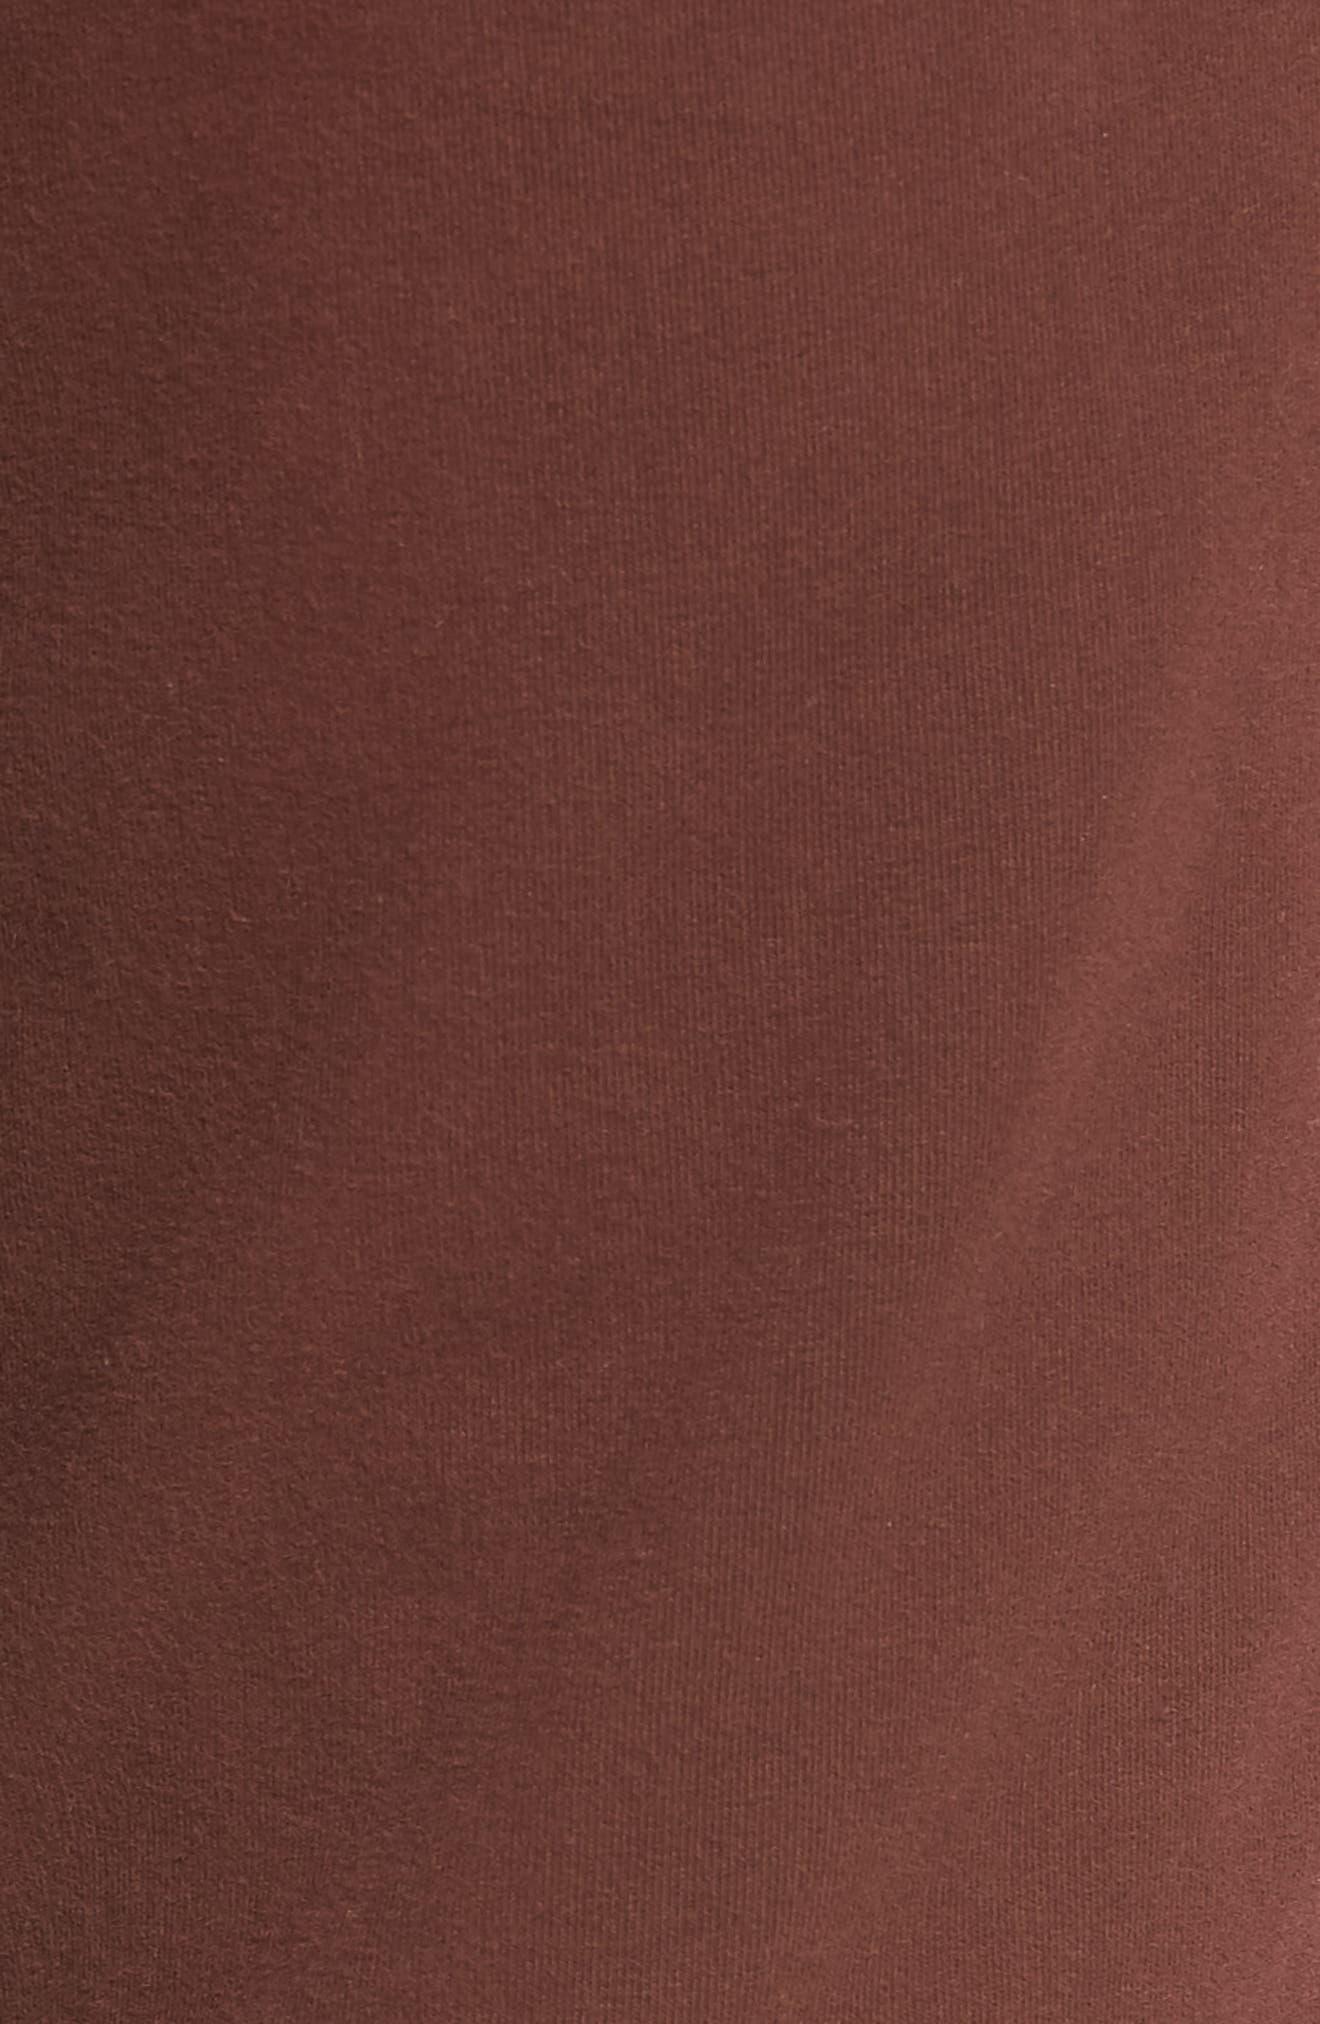 Slim Fit Sweatpants,                             Alternate thumbnail 5, color,                             WINE